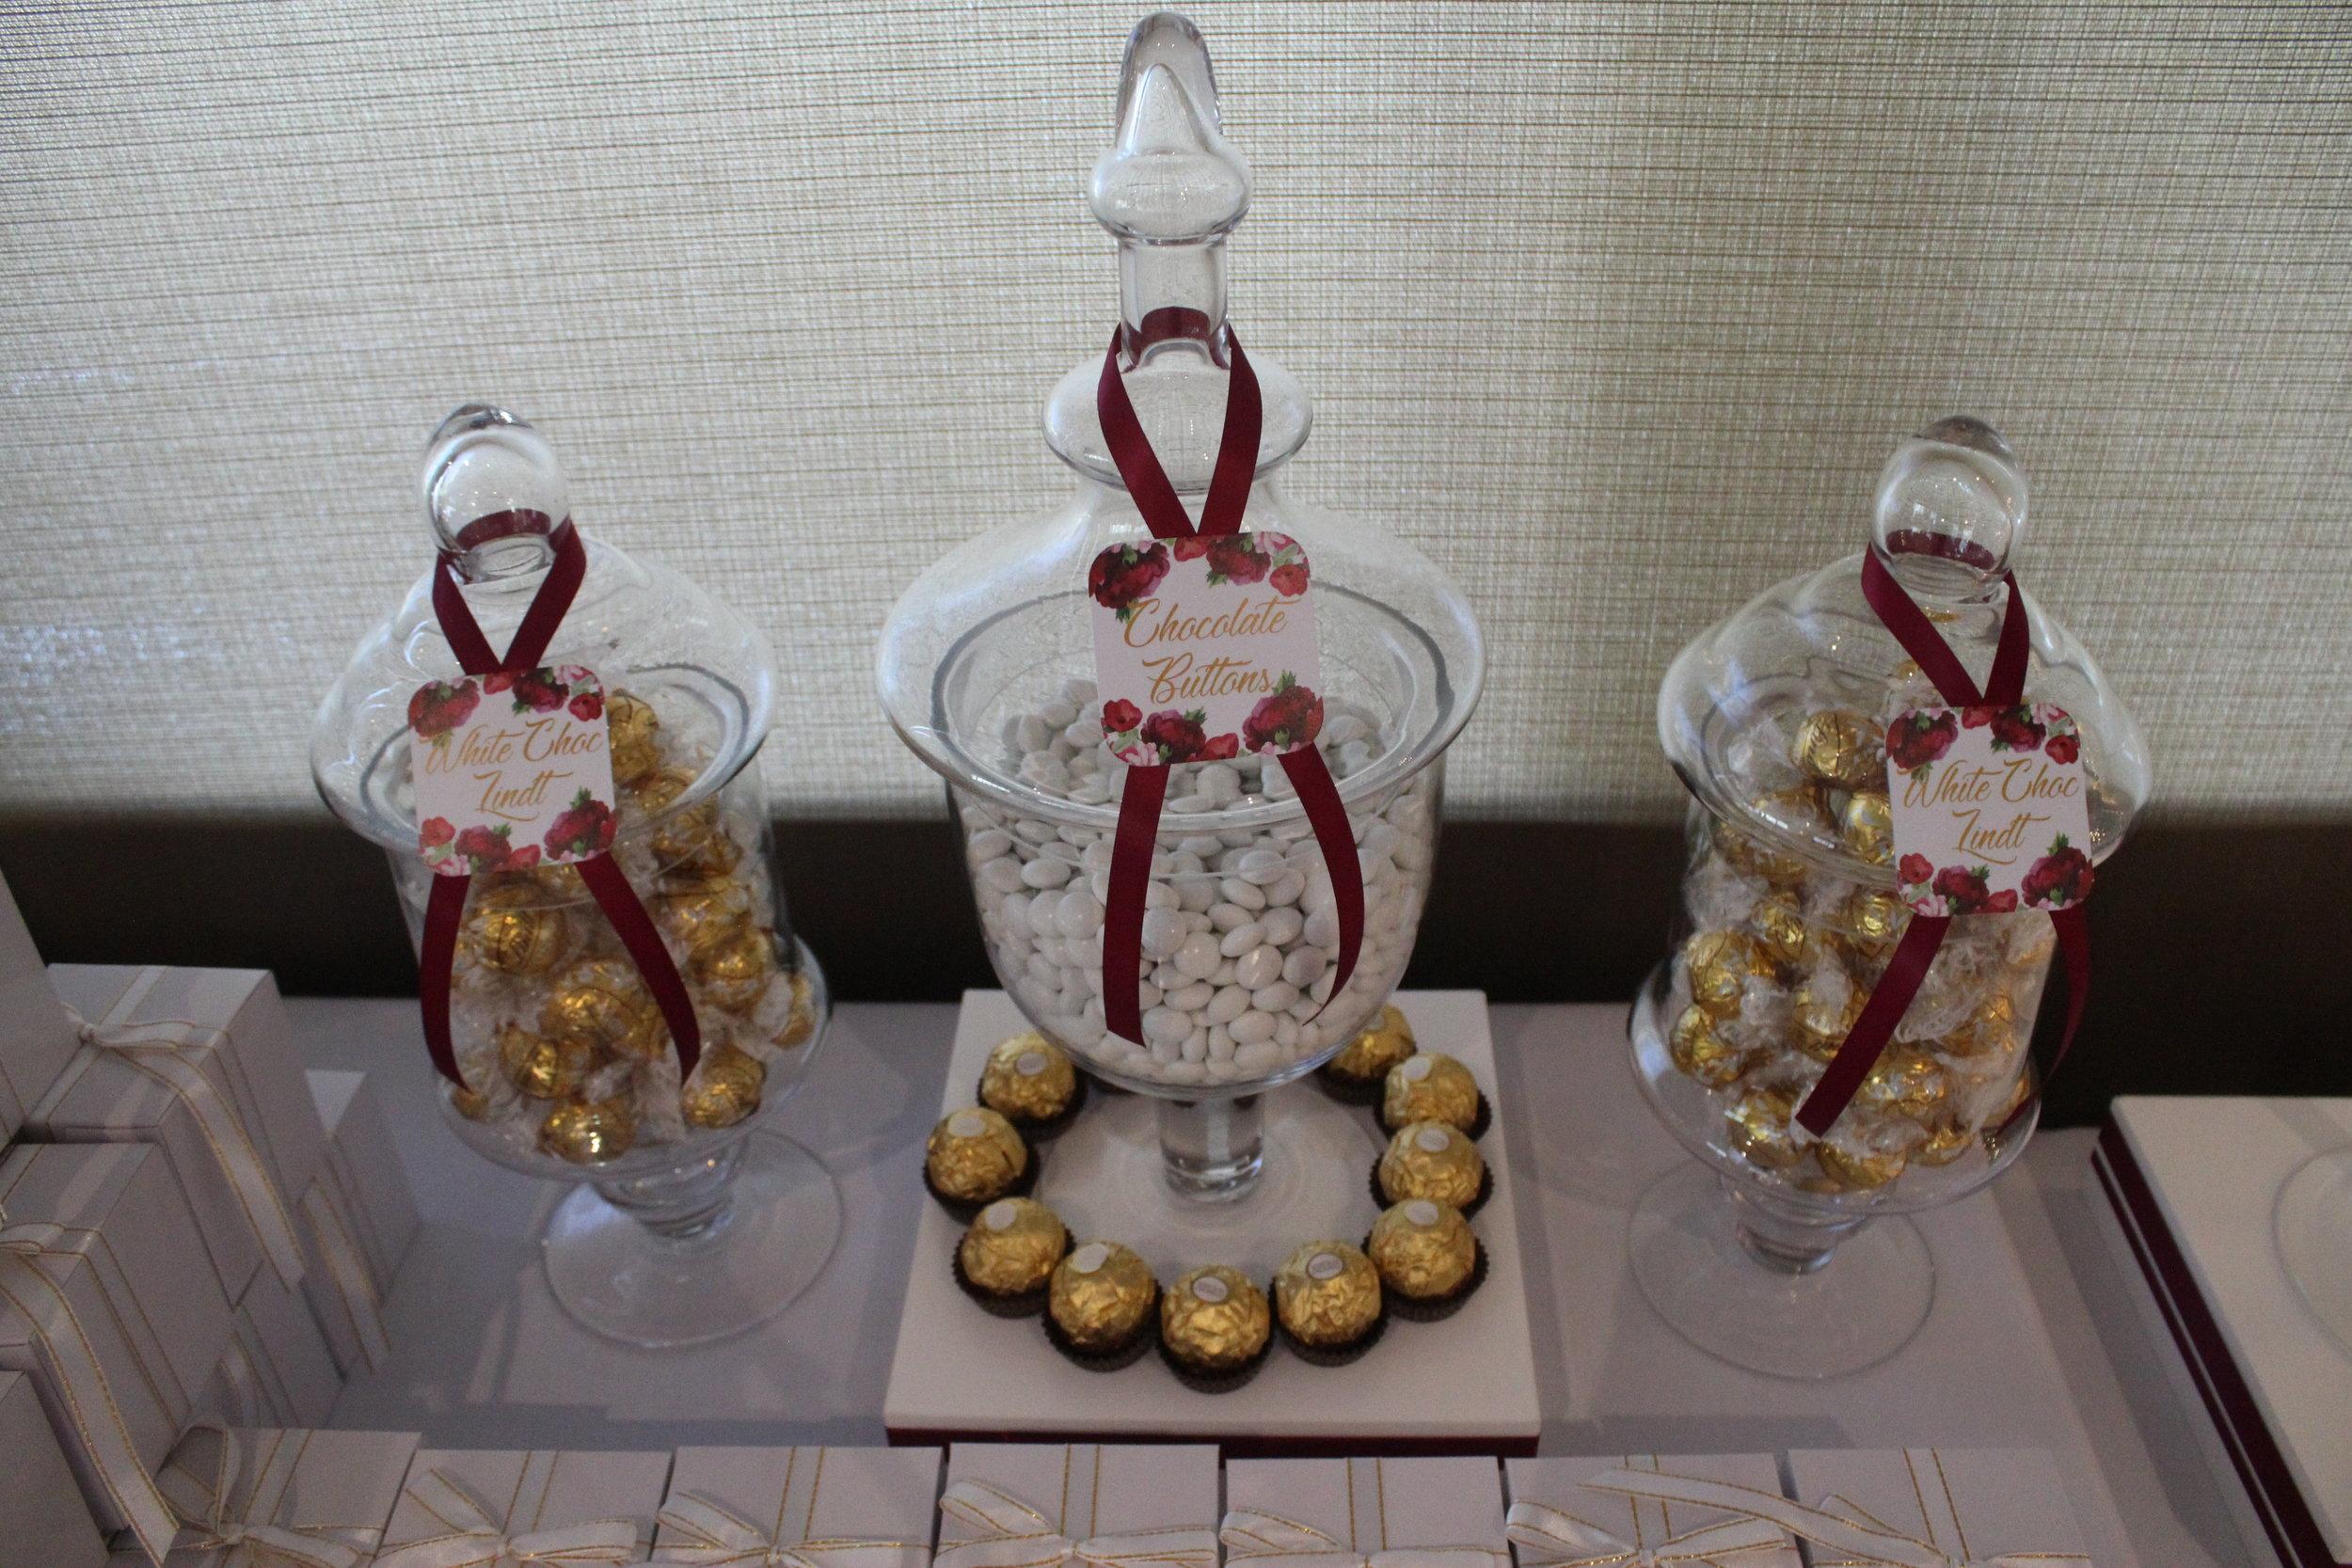 White Chocolate Lindt Lindor & Ferrero Rochers